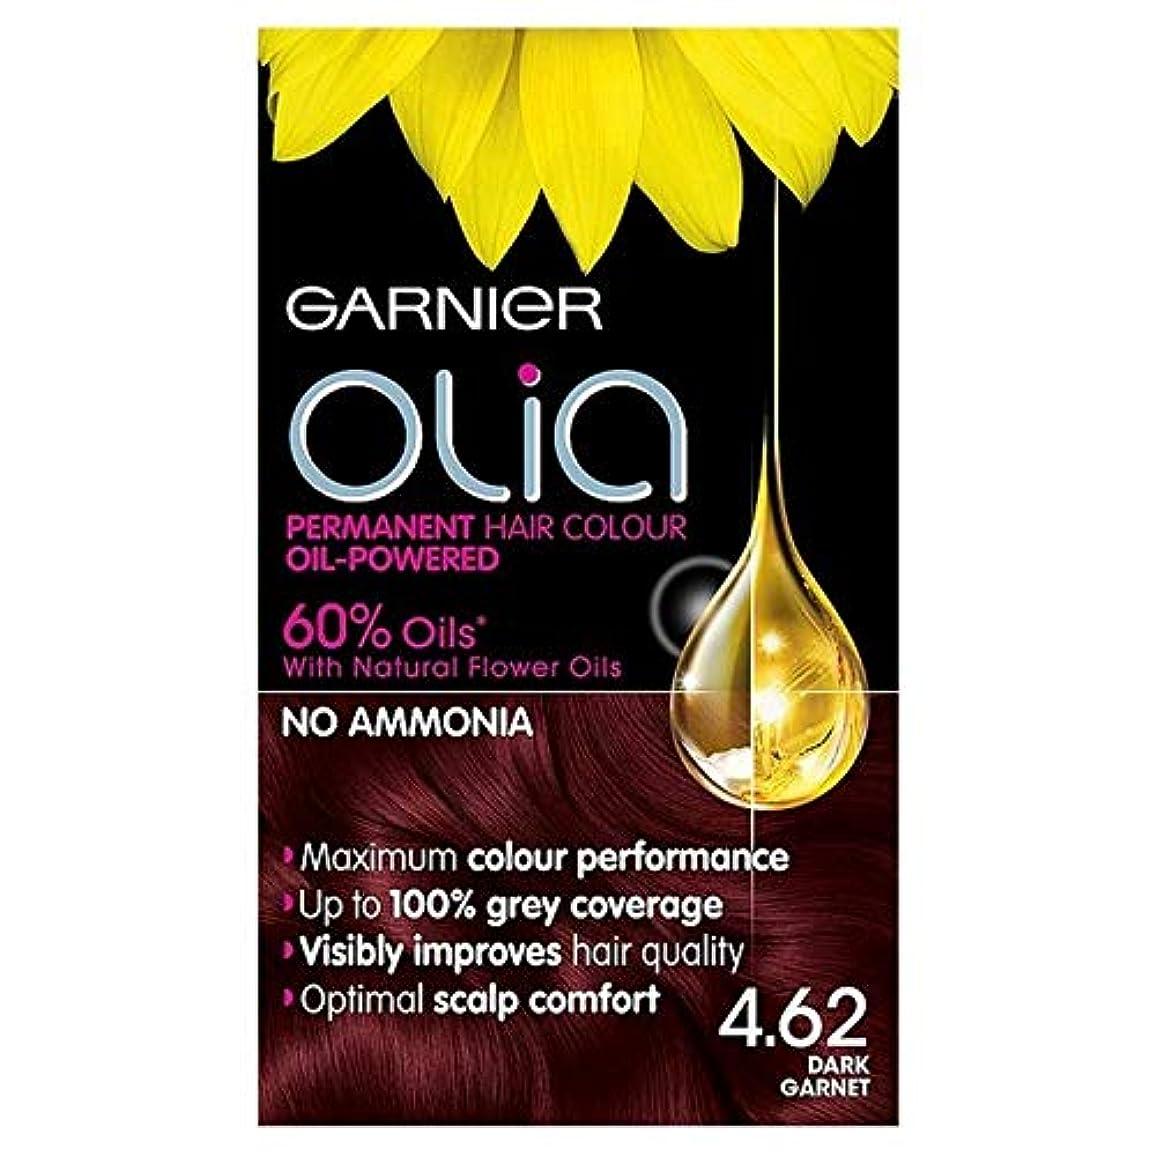 [Garnier ] ガルニエOlia 4.62濃いガーネット赤パーマネントヘアダイ - Garnier Olia 4.62 Dark Garnet Red Permanent Hair Dye [並行輸入品]